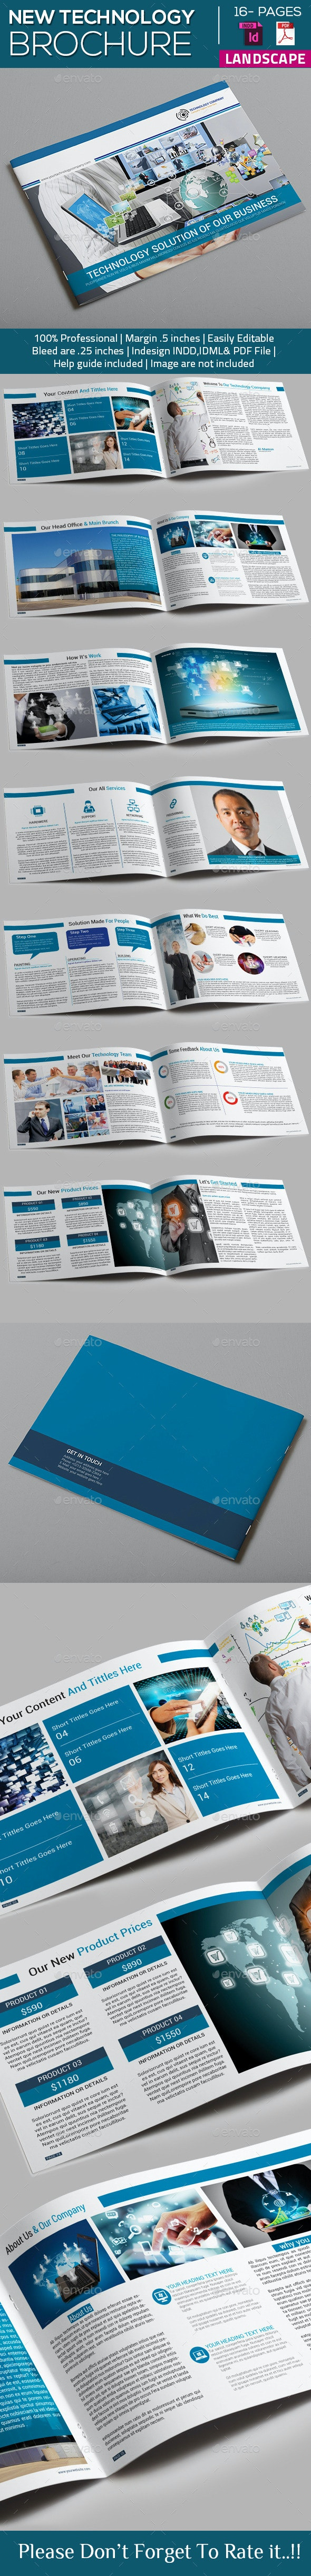 New Technology Brochure Catalog Templates - Catalogs Brochures